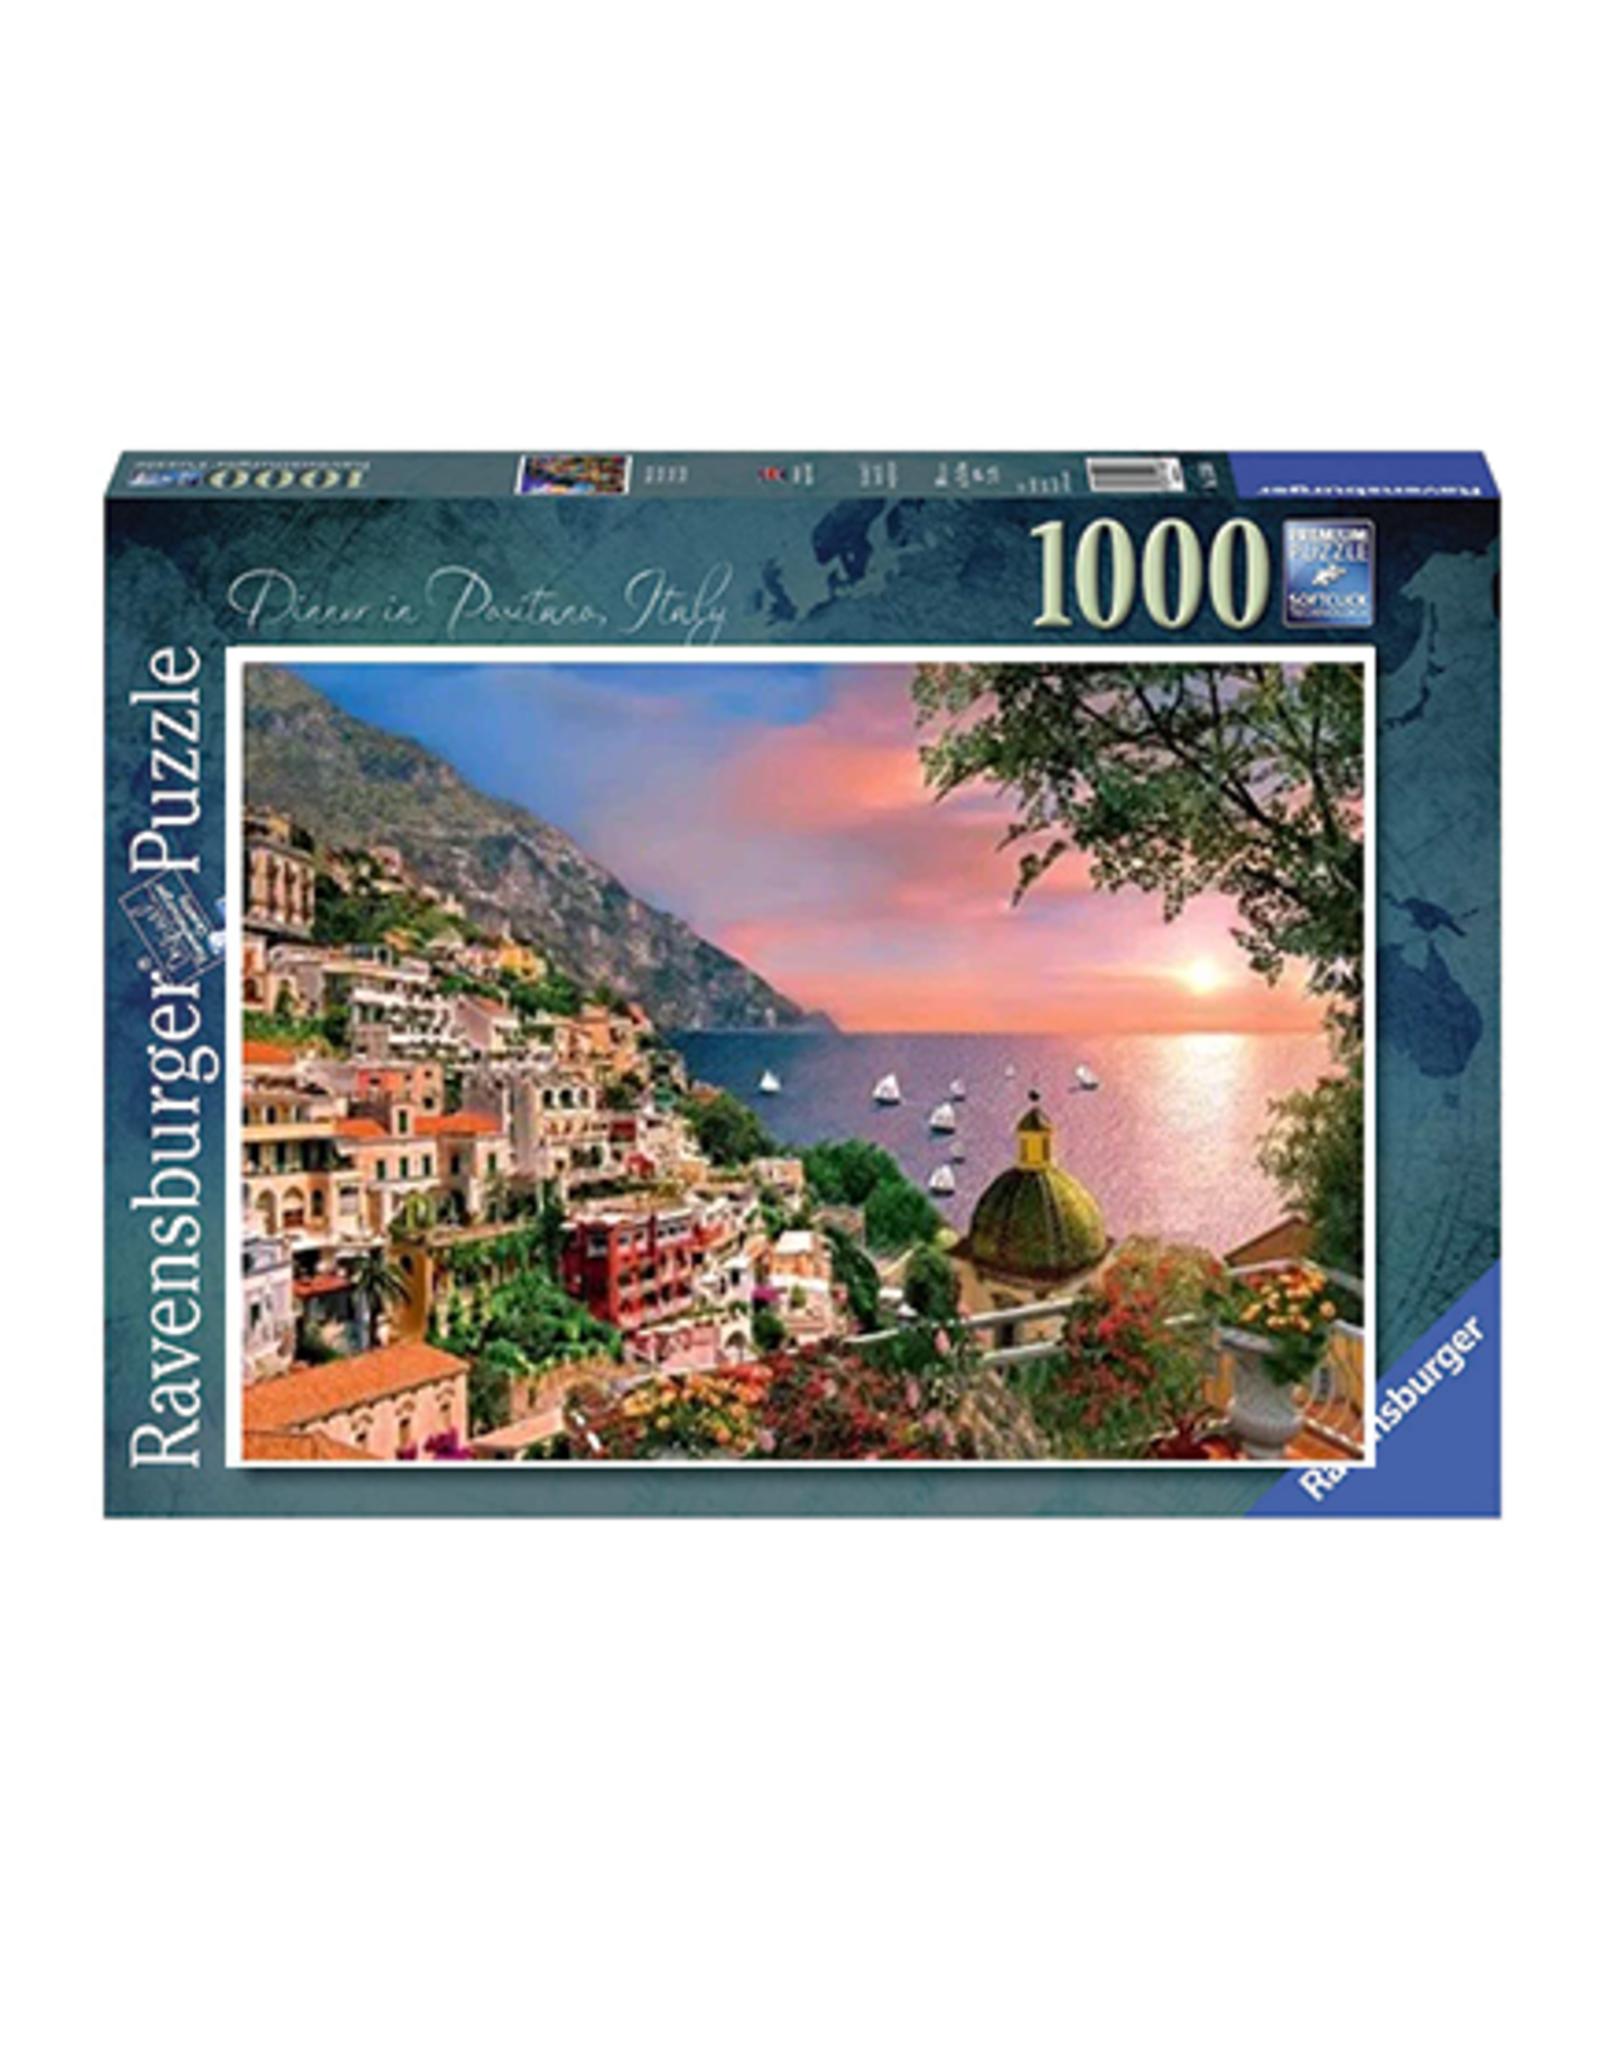 Ravensburger Positano 1000 Piece Puzzle